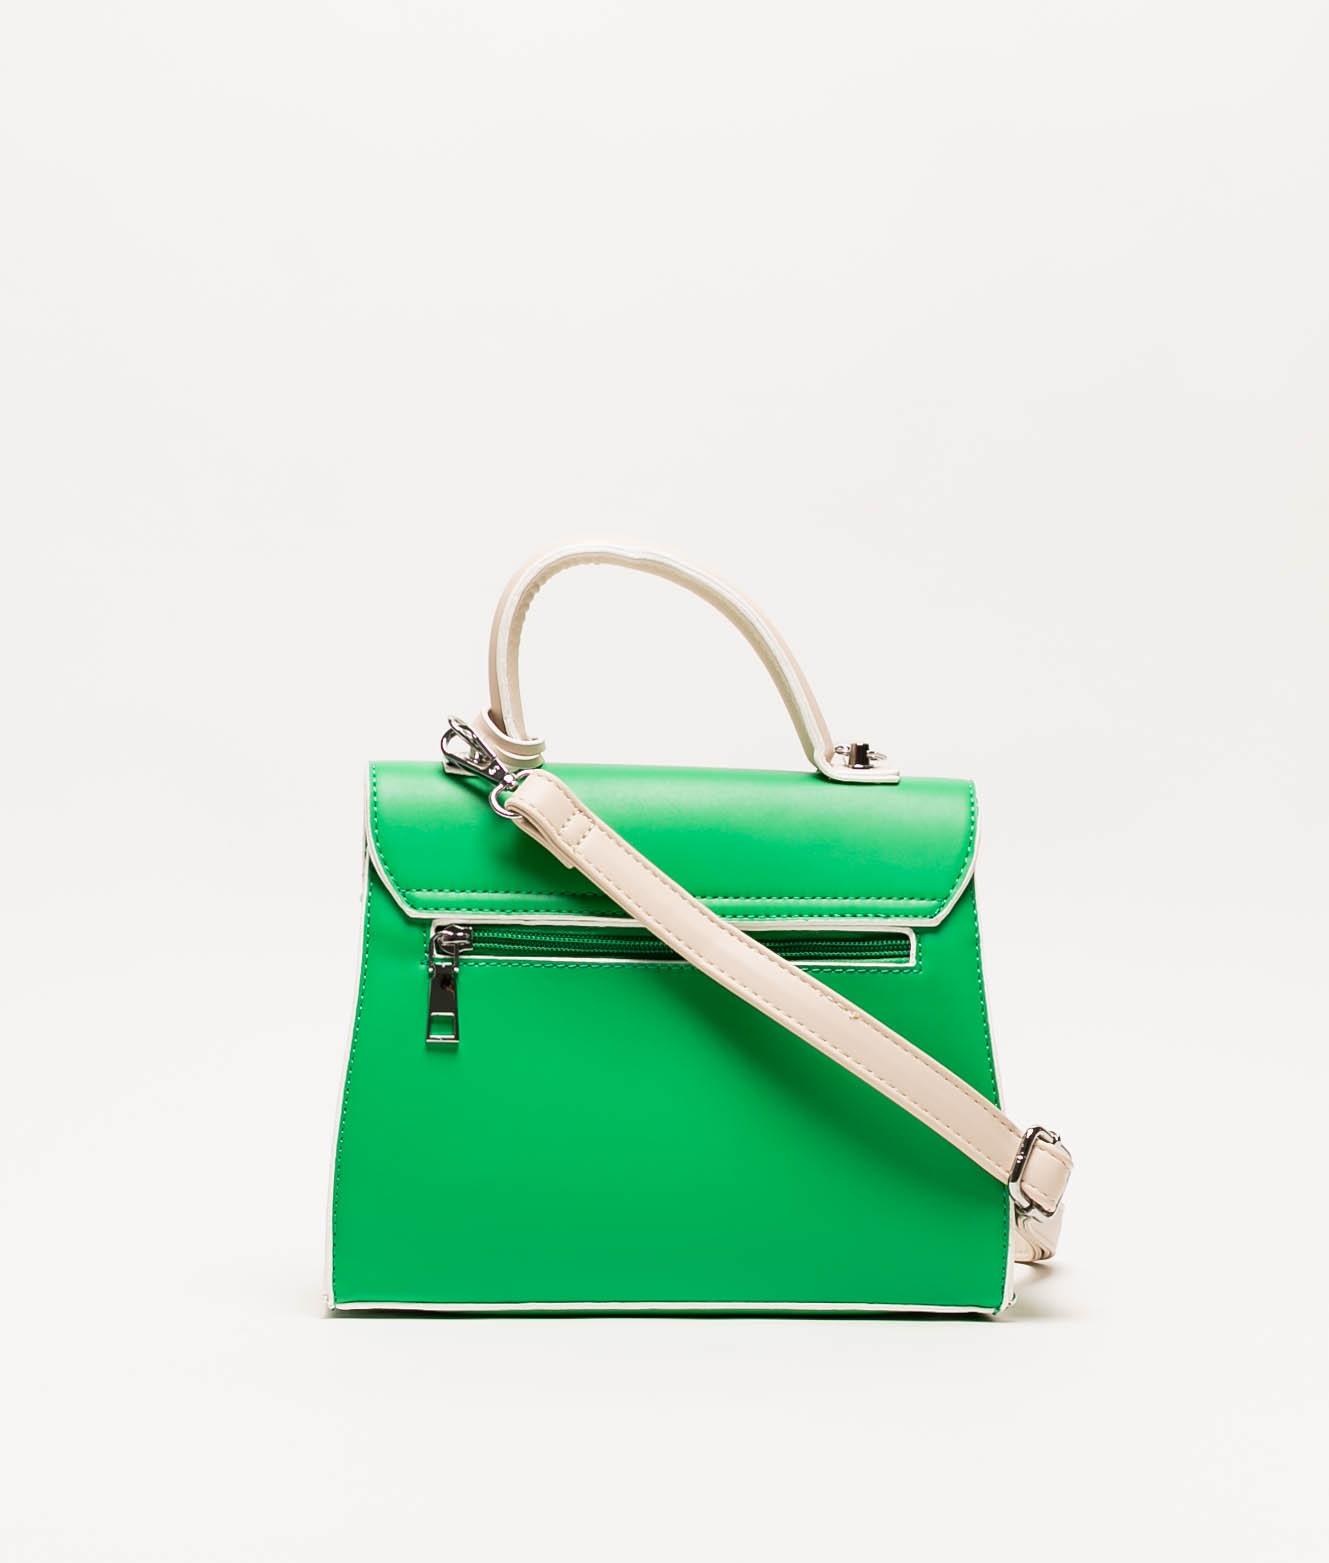 TLINGLIT BAG - GREEN